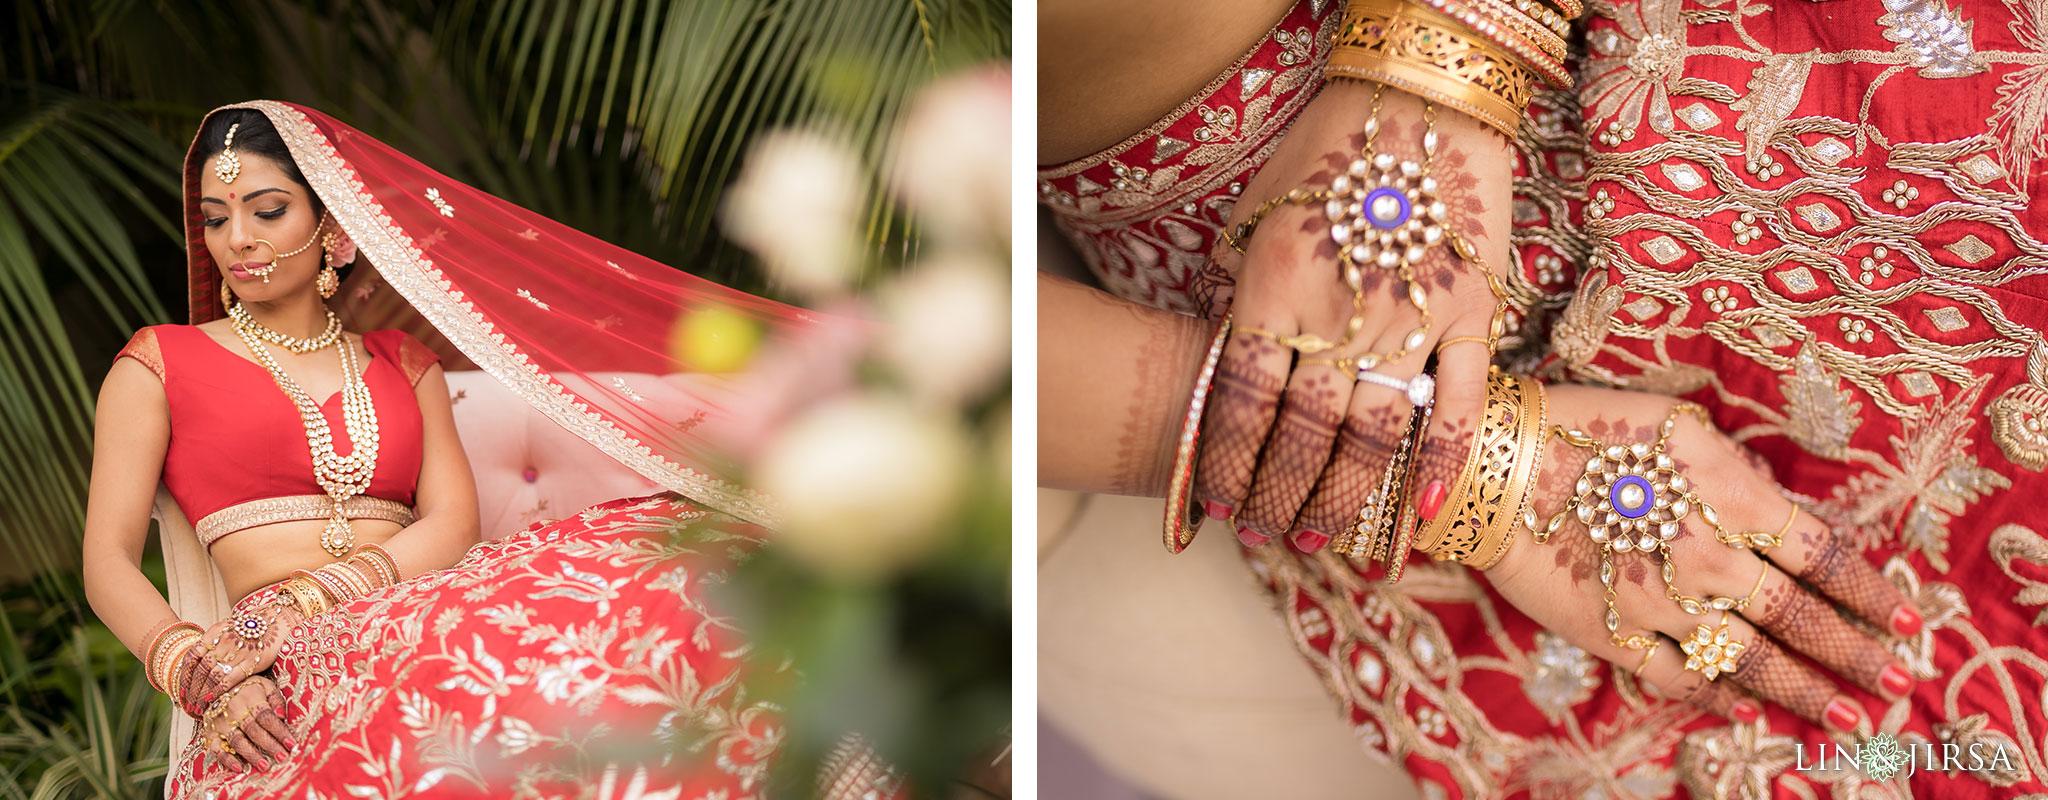 07 ritz carlton laguna niguel indian bride wedding photography